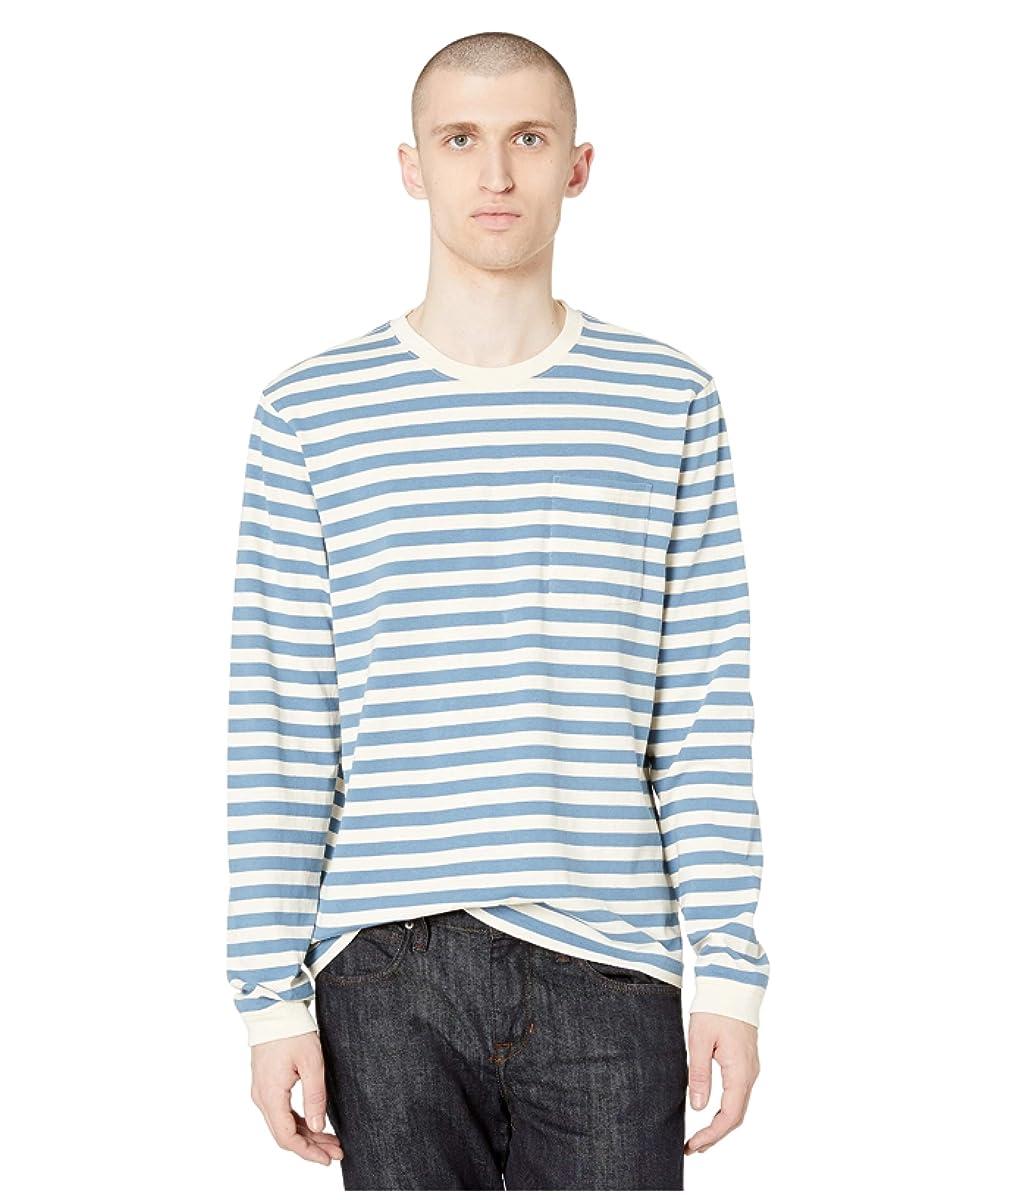 J.Crew Heritage Jersey Long Sleeve Classic Stripe (9394593867870)